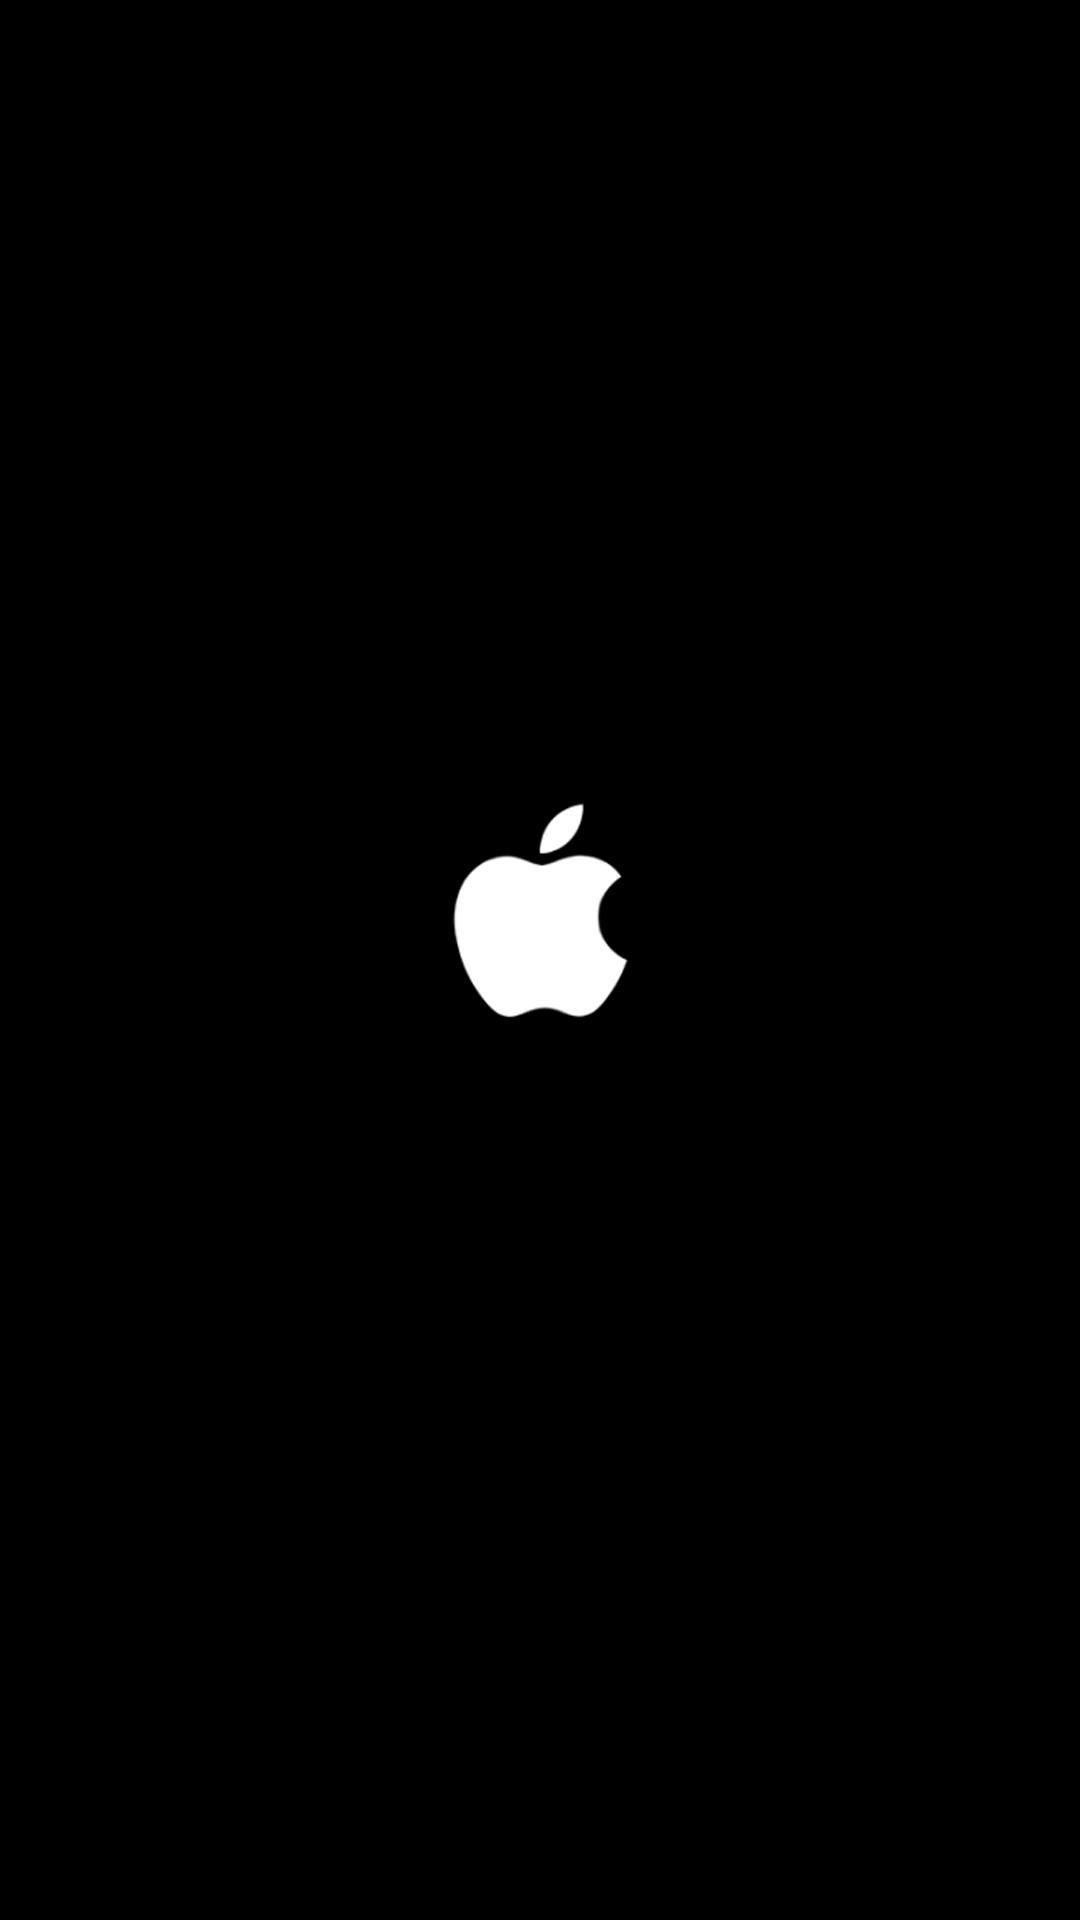 Champagne gold Apple logo | iPhone Wallpaper | Wallpaper | Fondos de pantalla de iphone ...